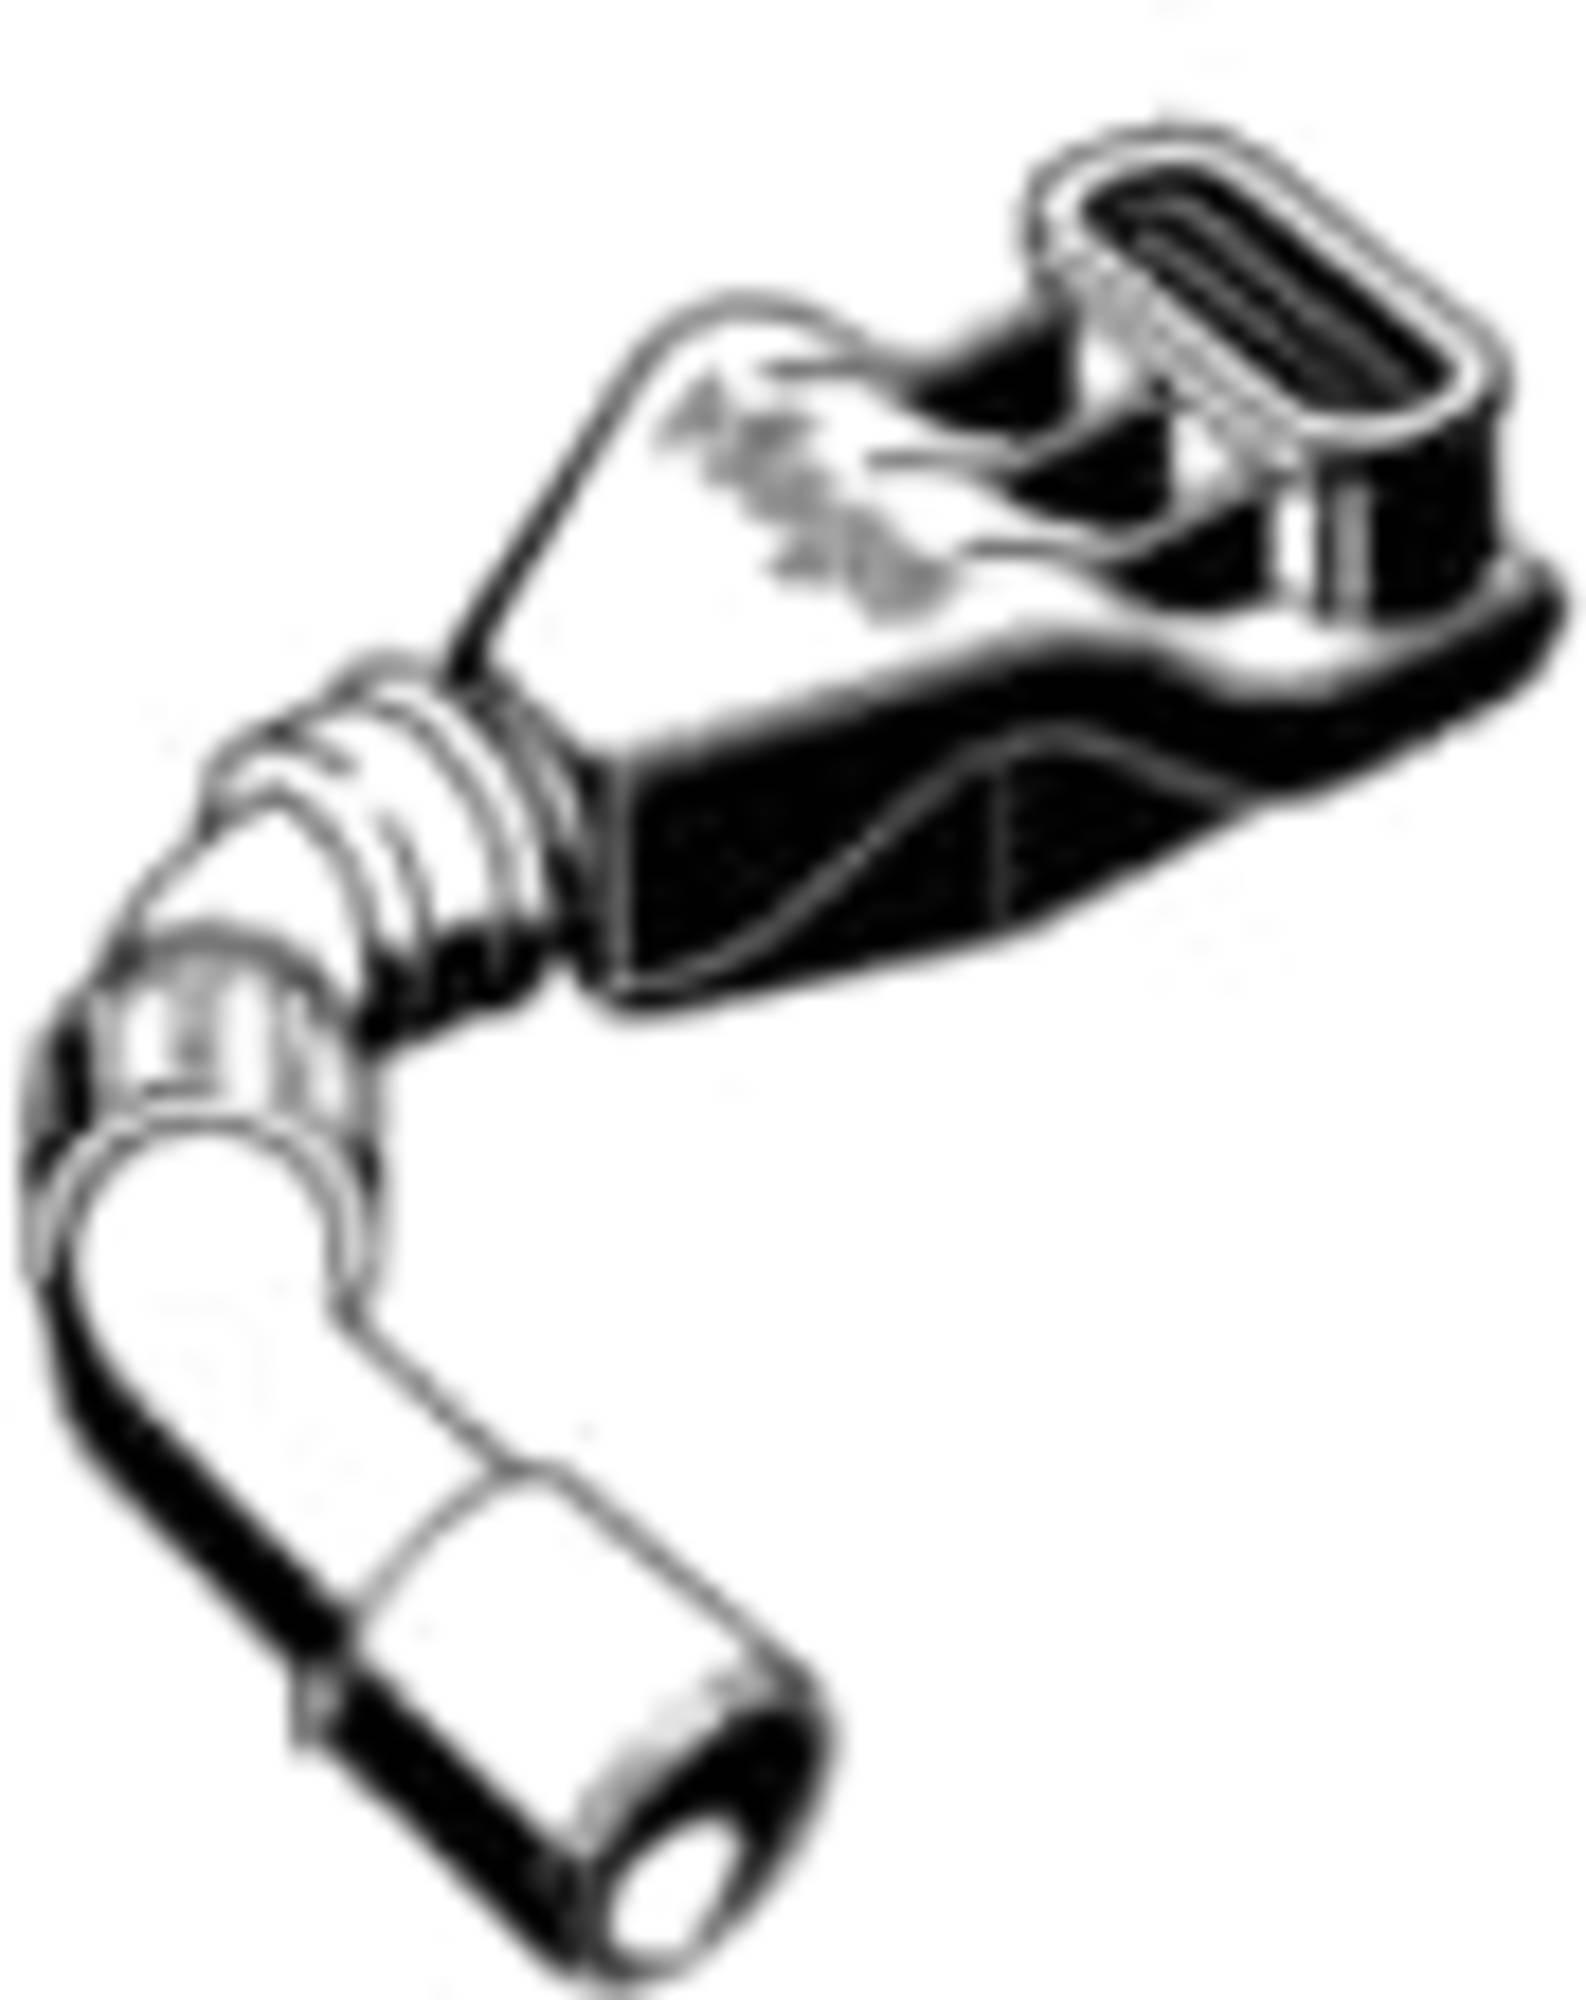 Viega inbouw sifon grijs 736743